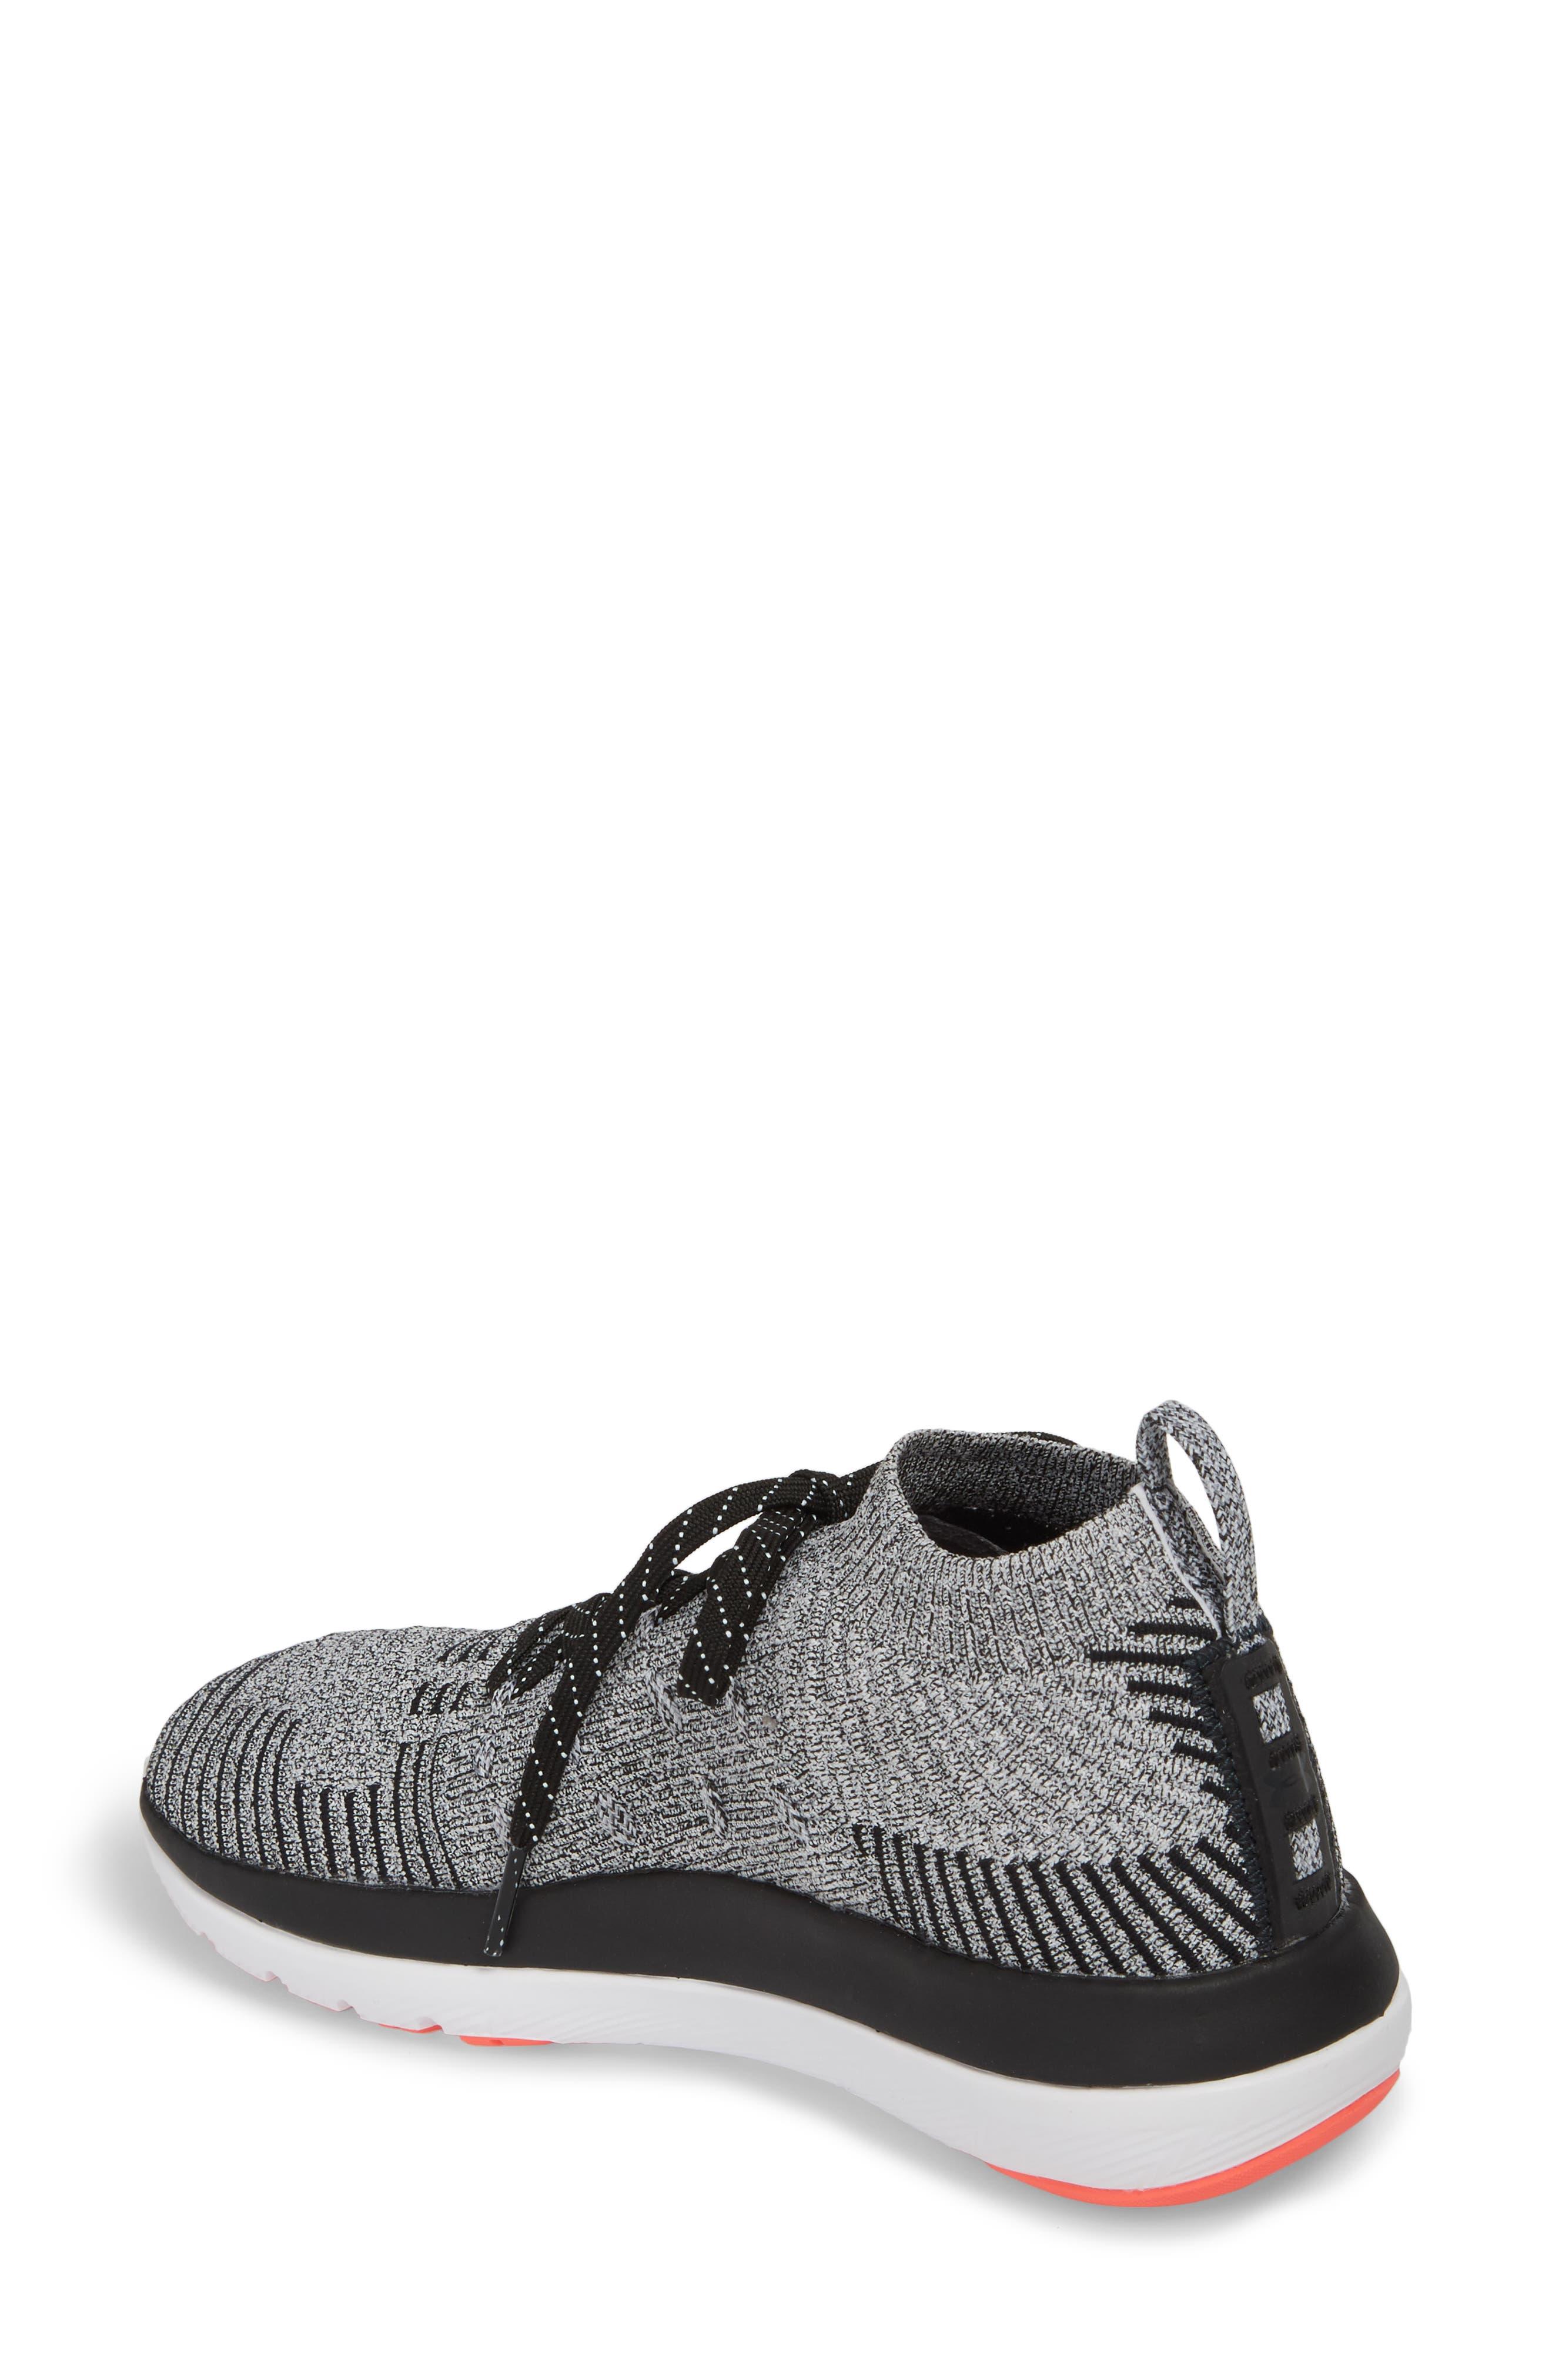 Slingflex Rise Sneaker,                             Alternate thumbnail 4, color,